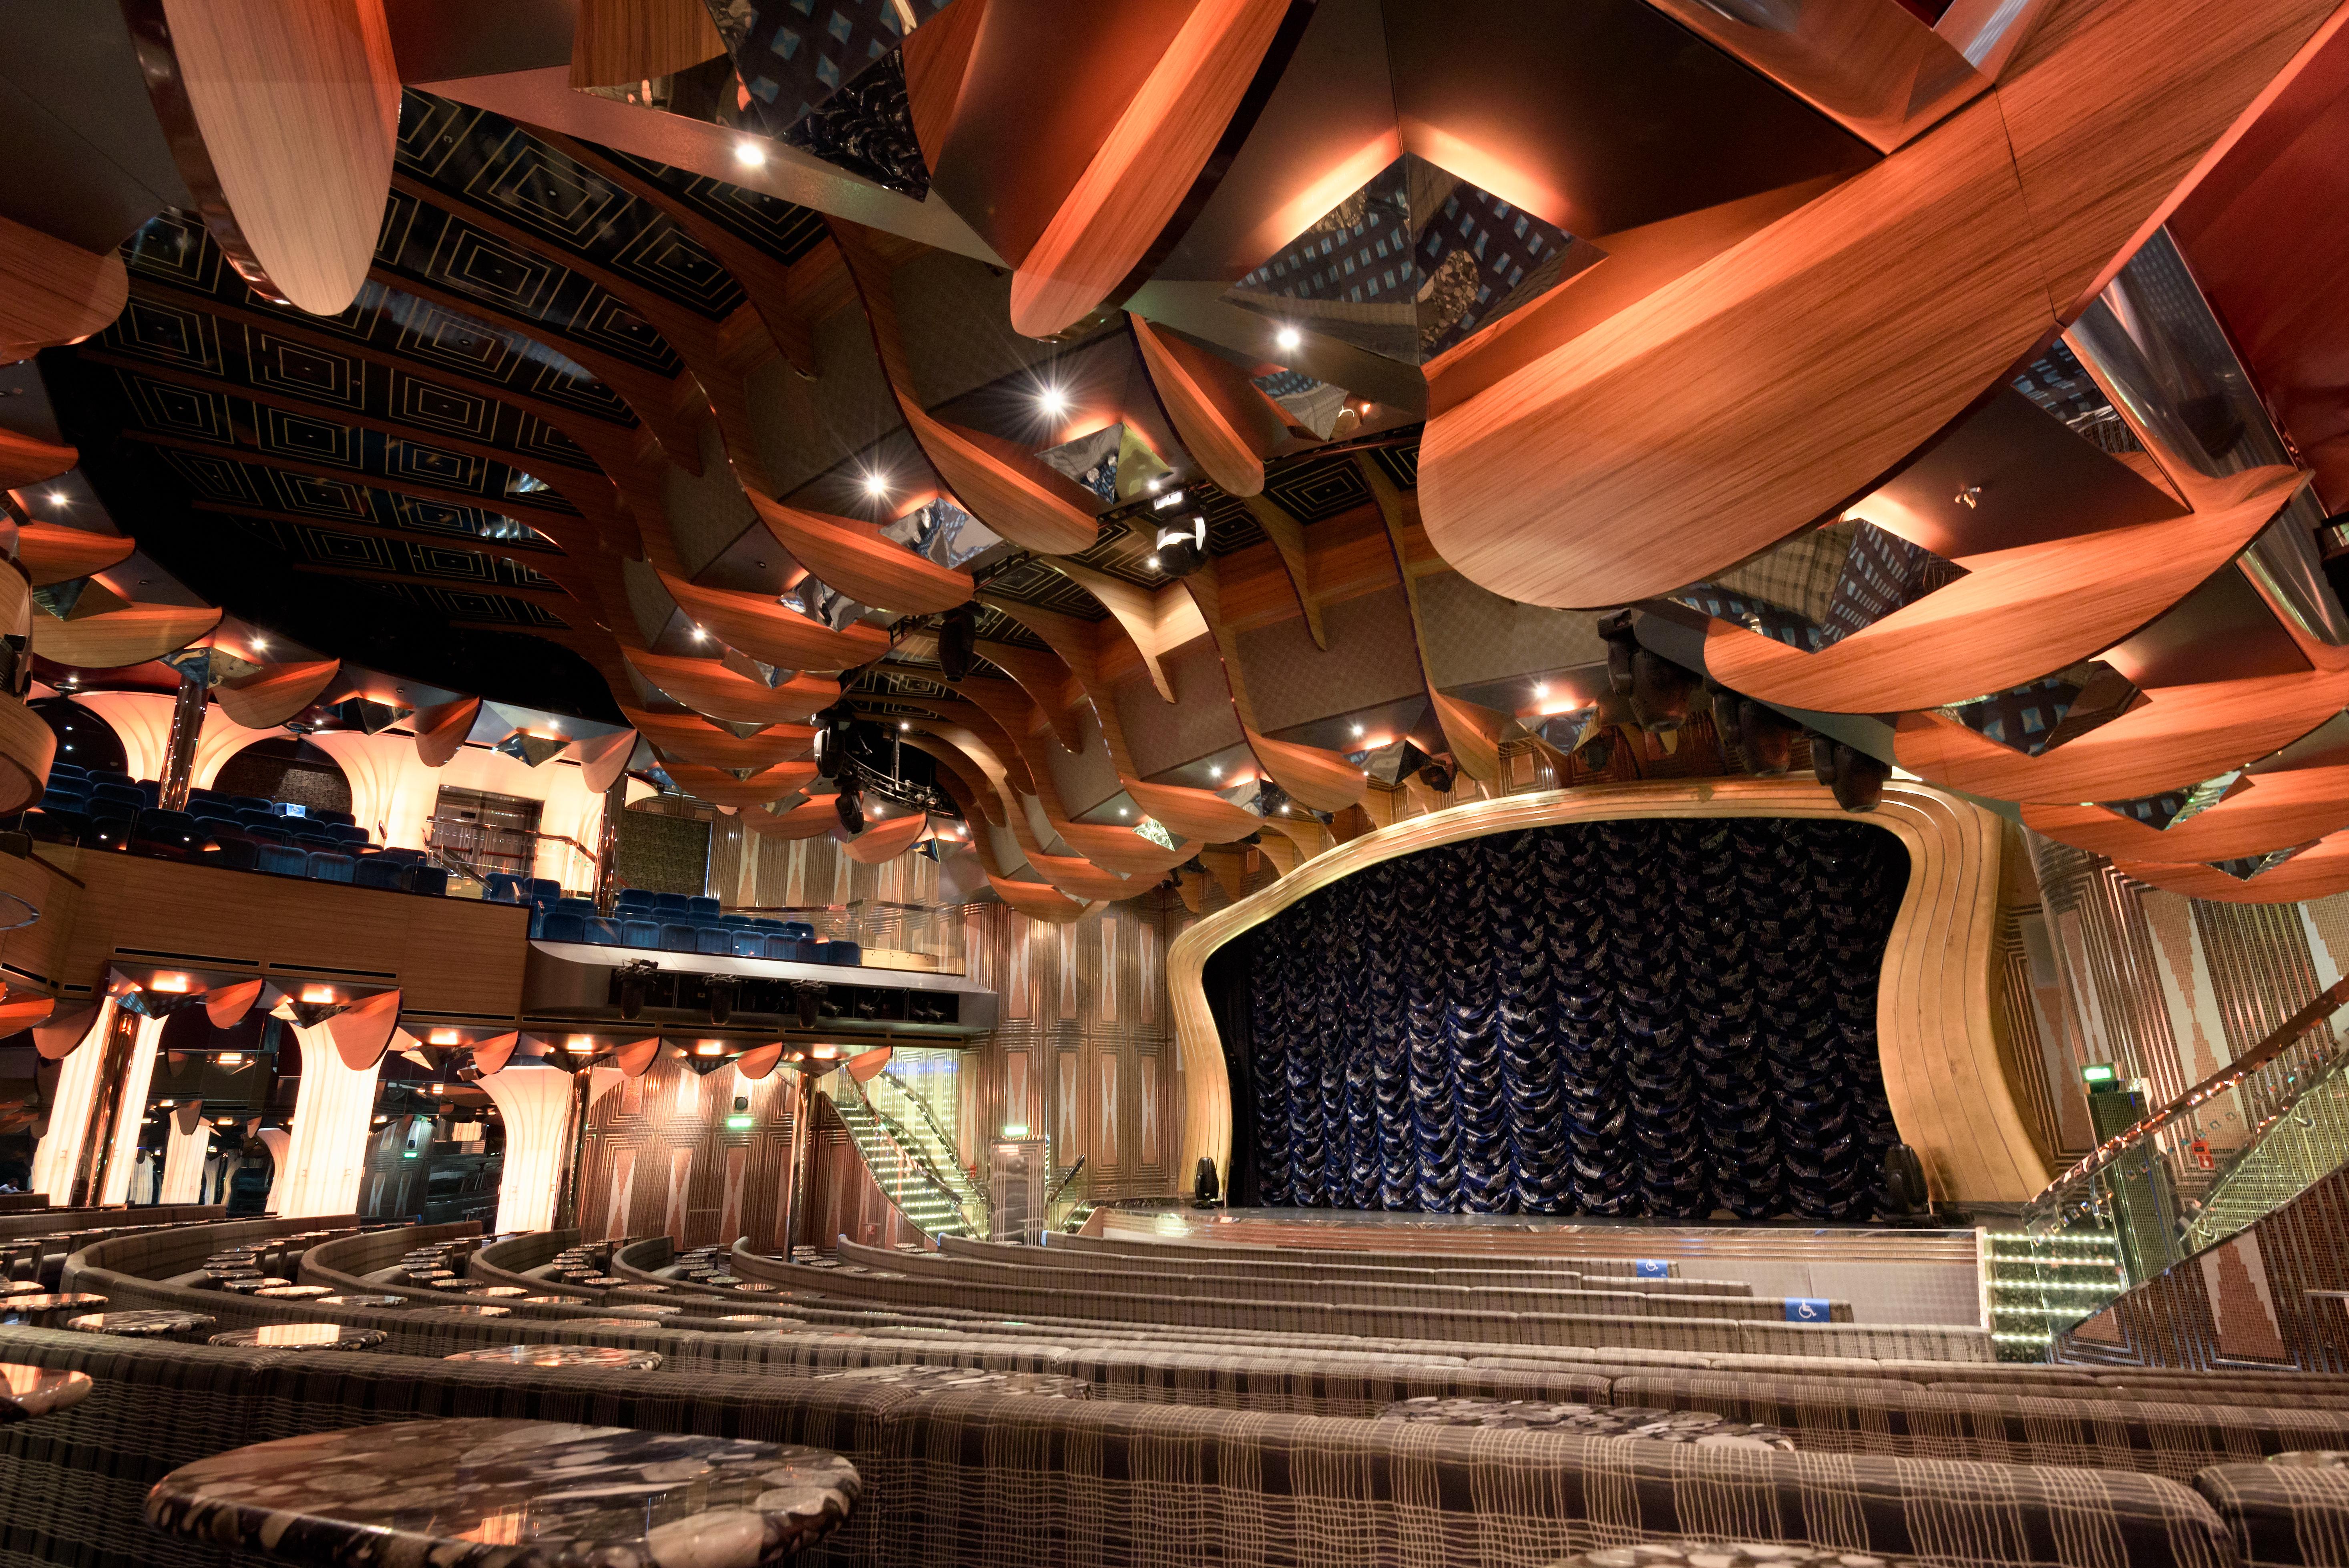 Auditorium Ship Mediterranean Italy Nikon Interior Design Cruise 2016 Theatre Free Stage Publicdomain Venezia Veneto Costa